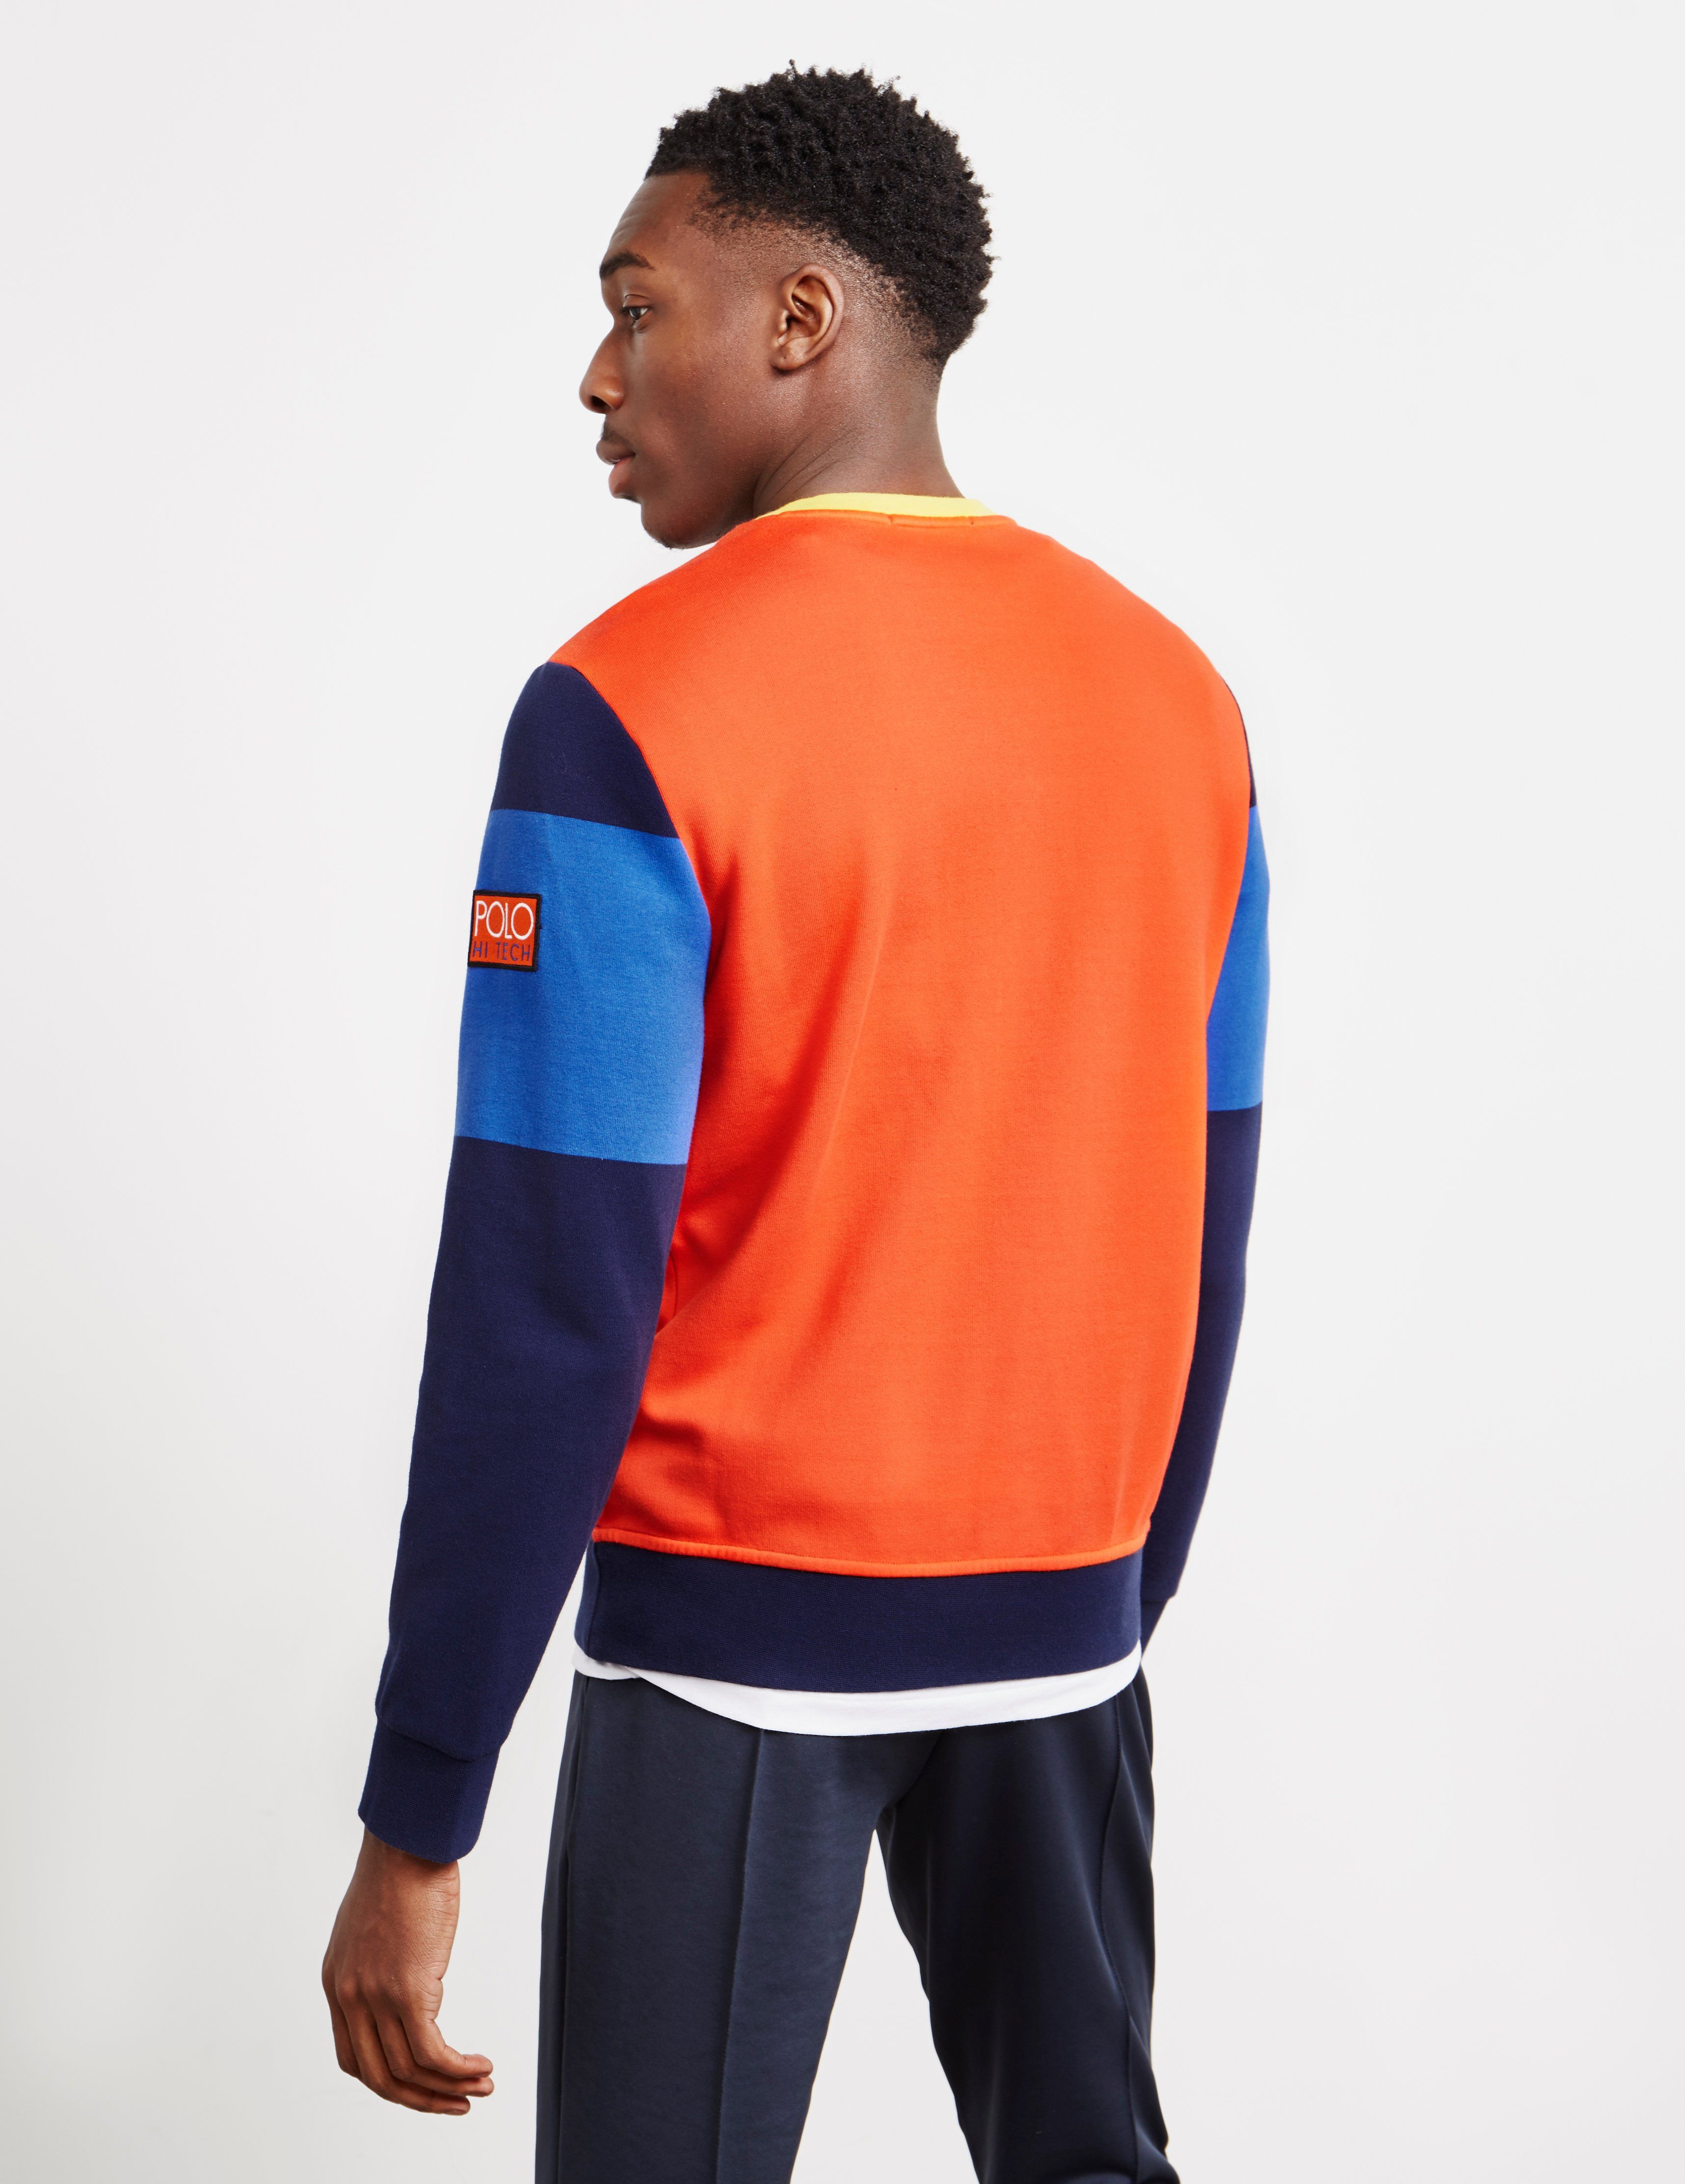 Polo Ralph Lauren Hi Tech Climb Sweatshirt